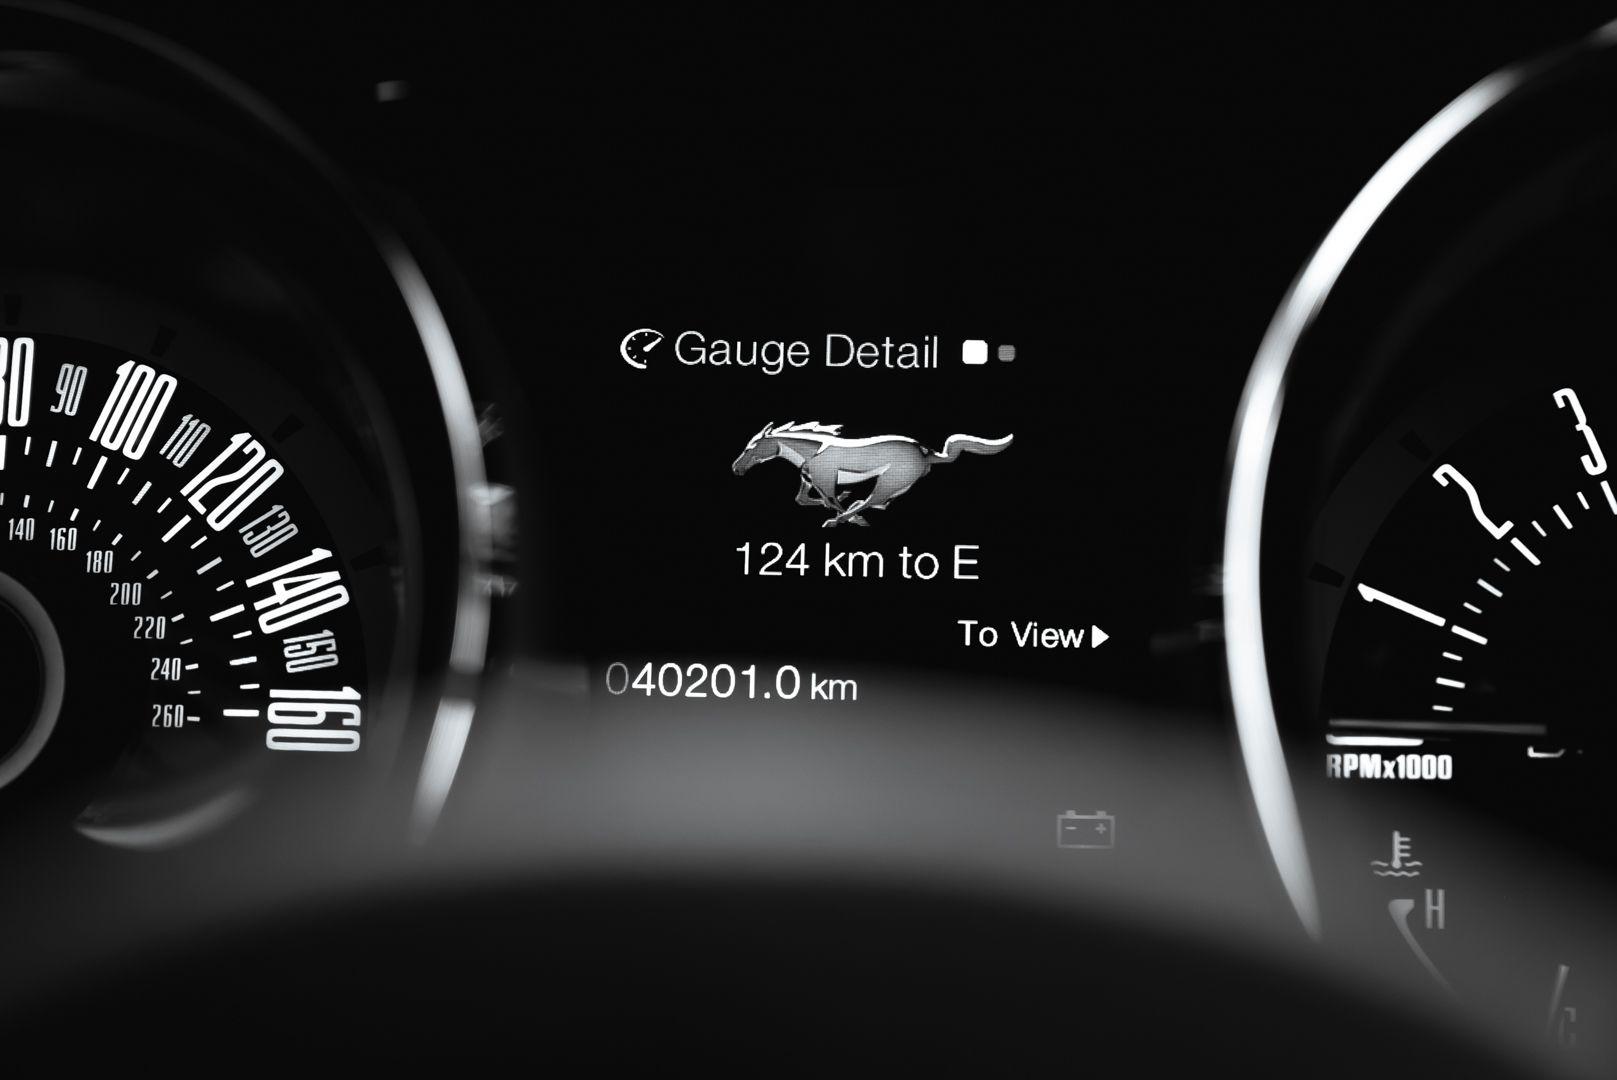 2012 Ford Mustang 5.0 V8 82105